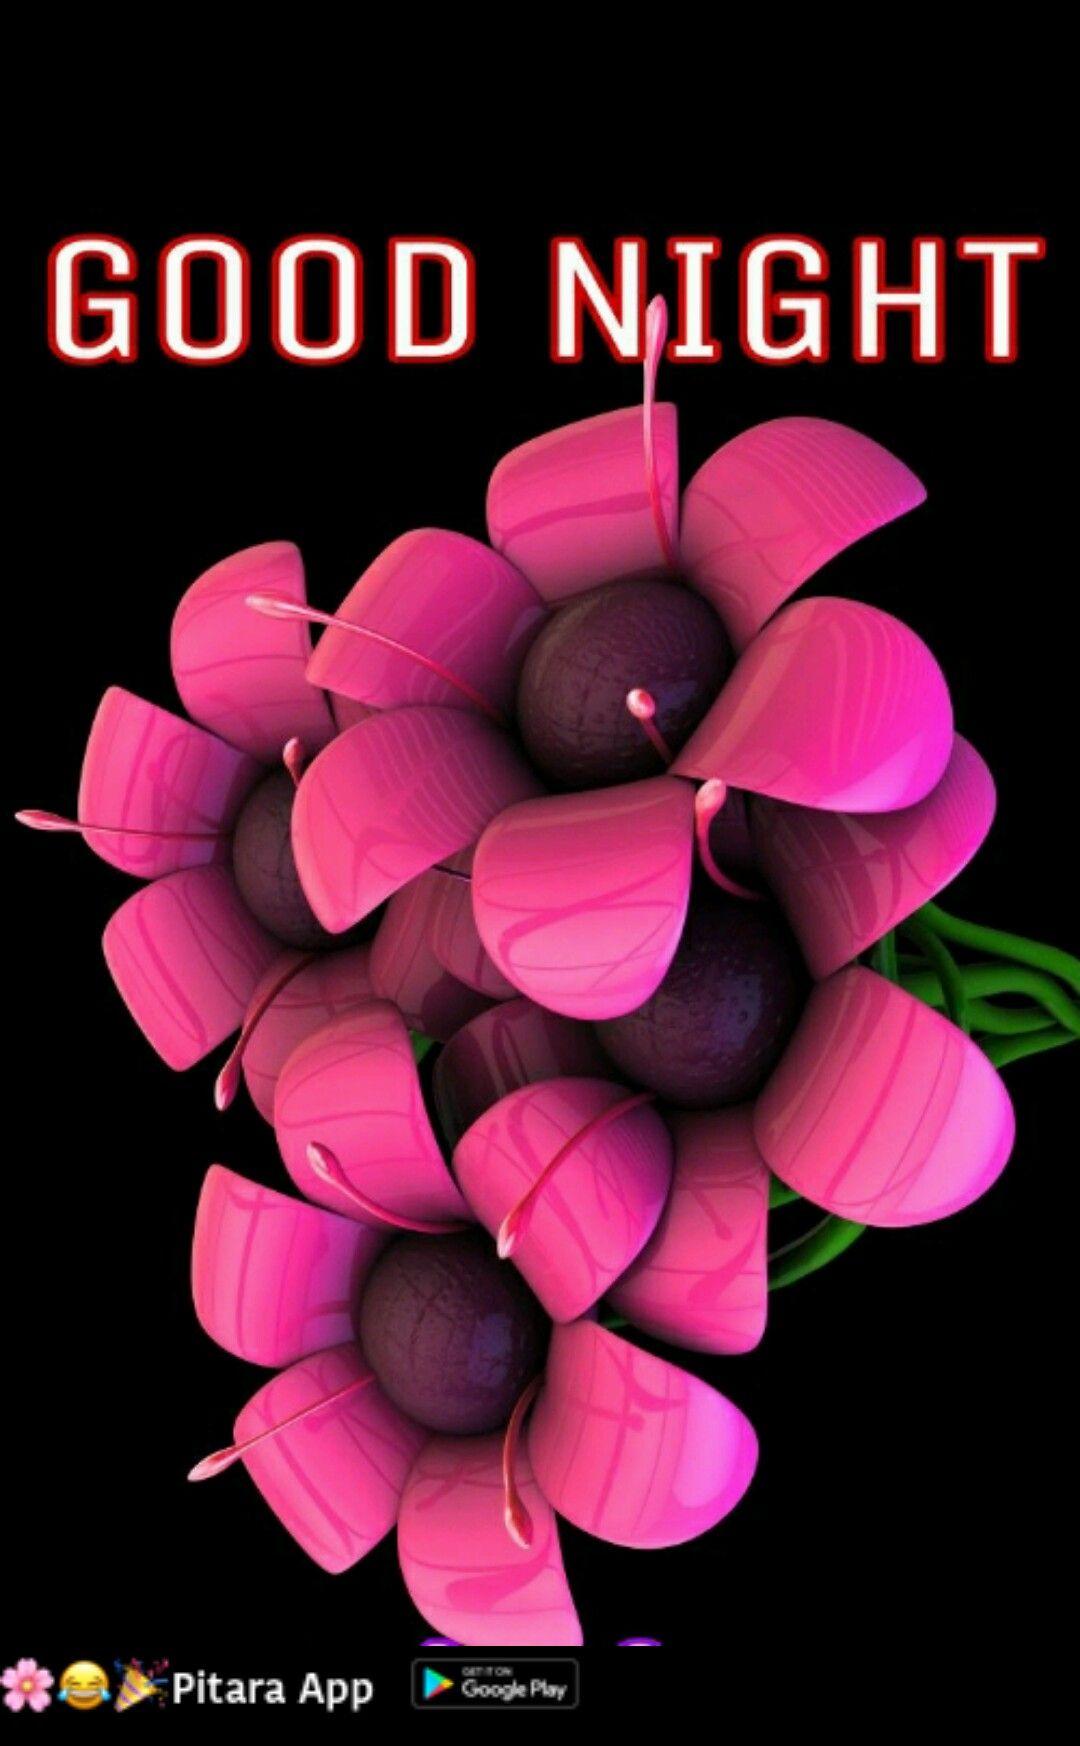 Good night sweet dreams Good Night FB post